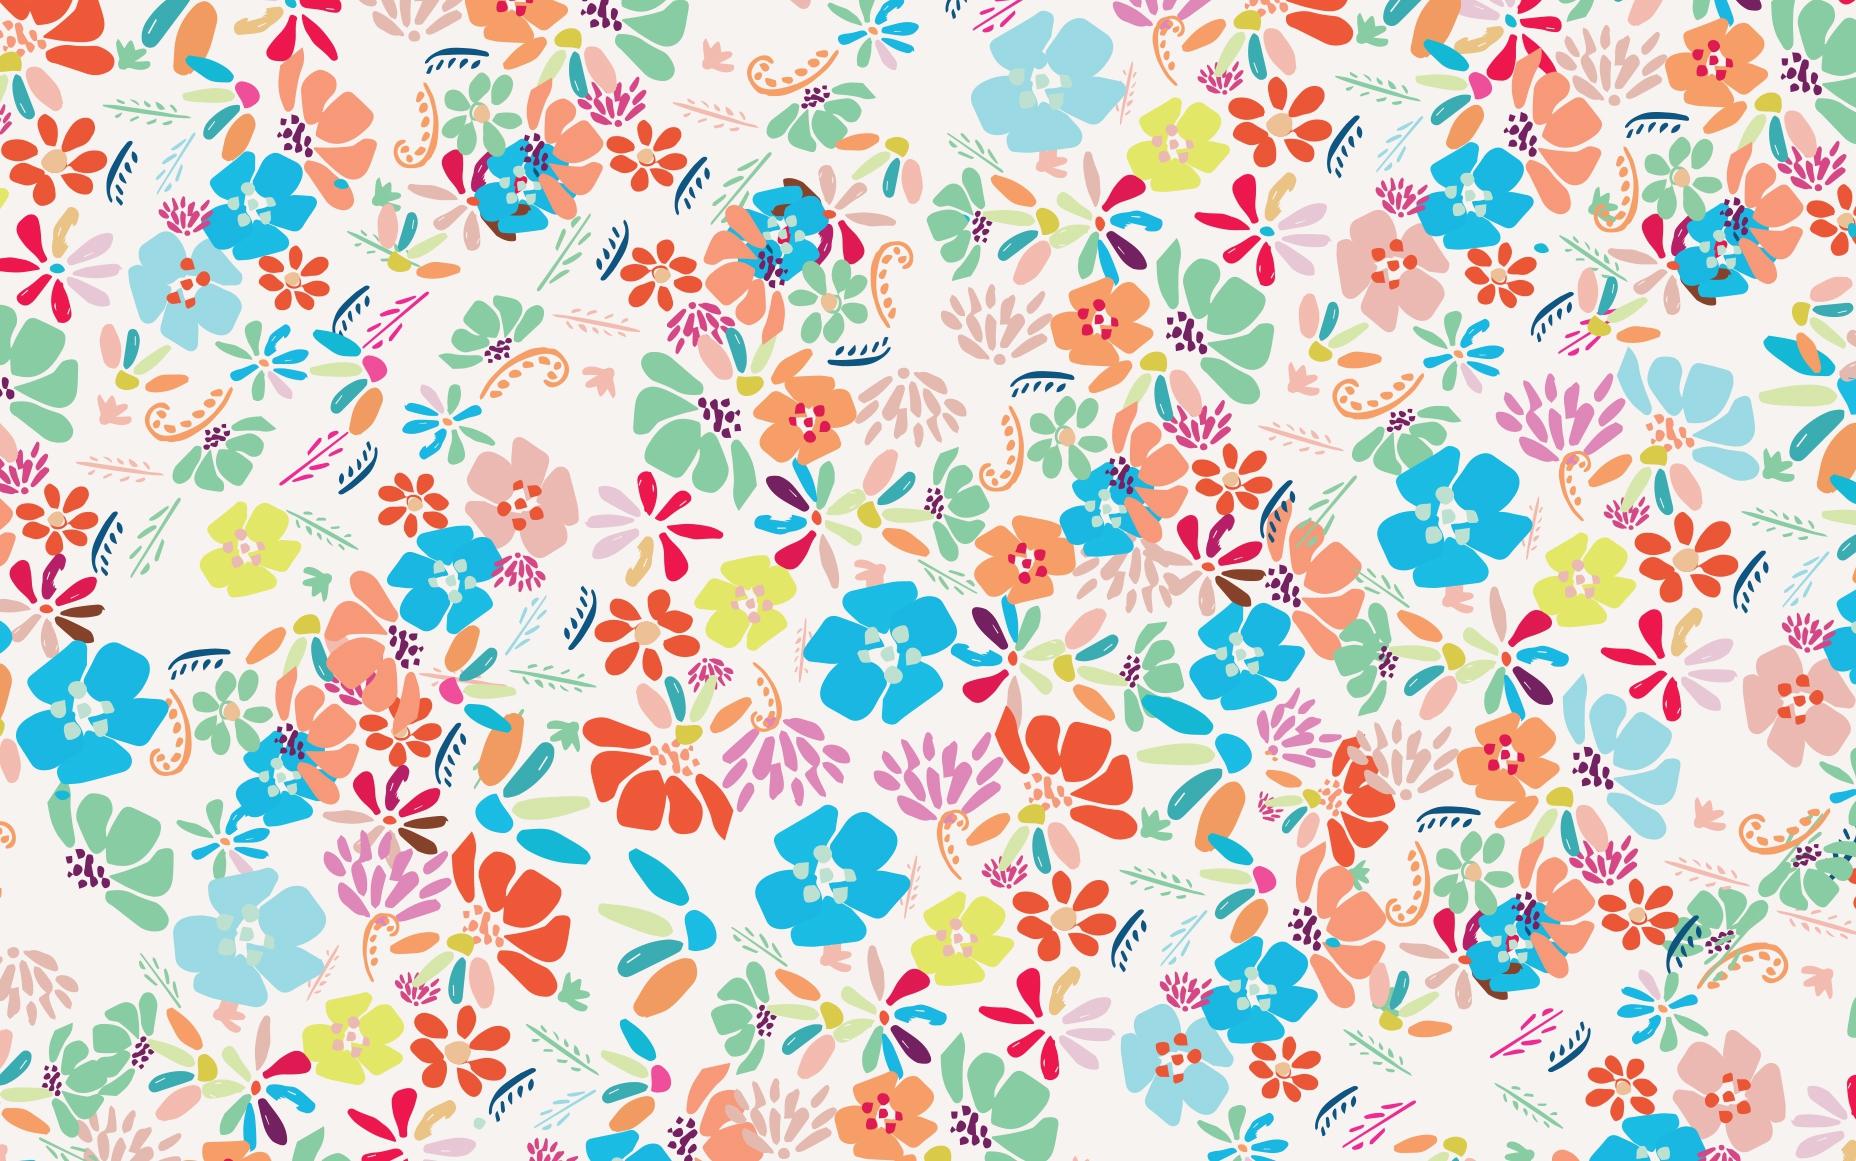 pushprintstudio_smr16_floral_dlf-desktop